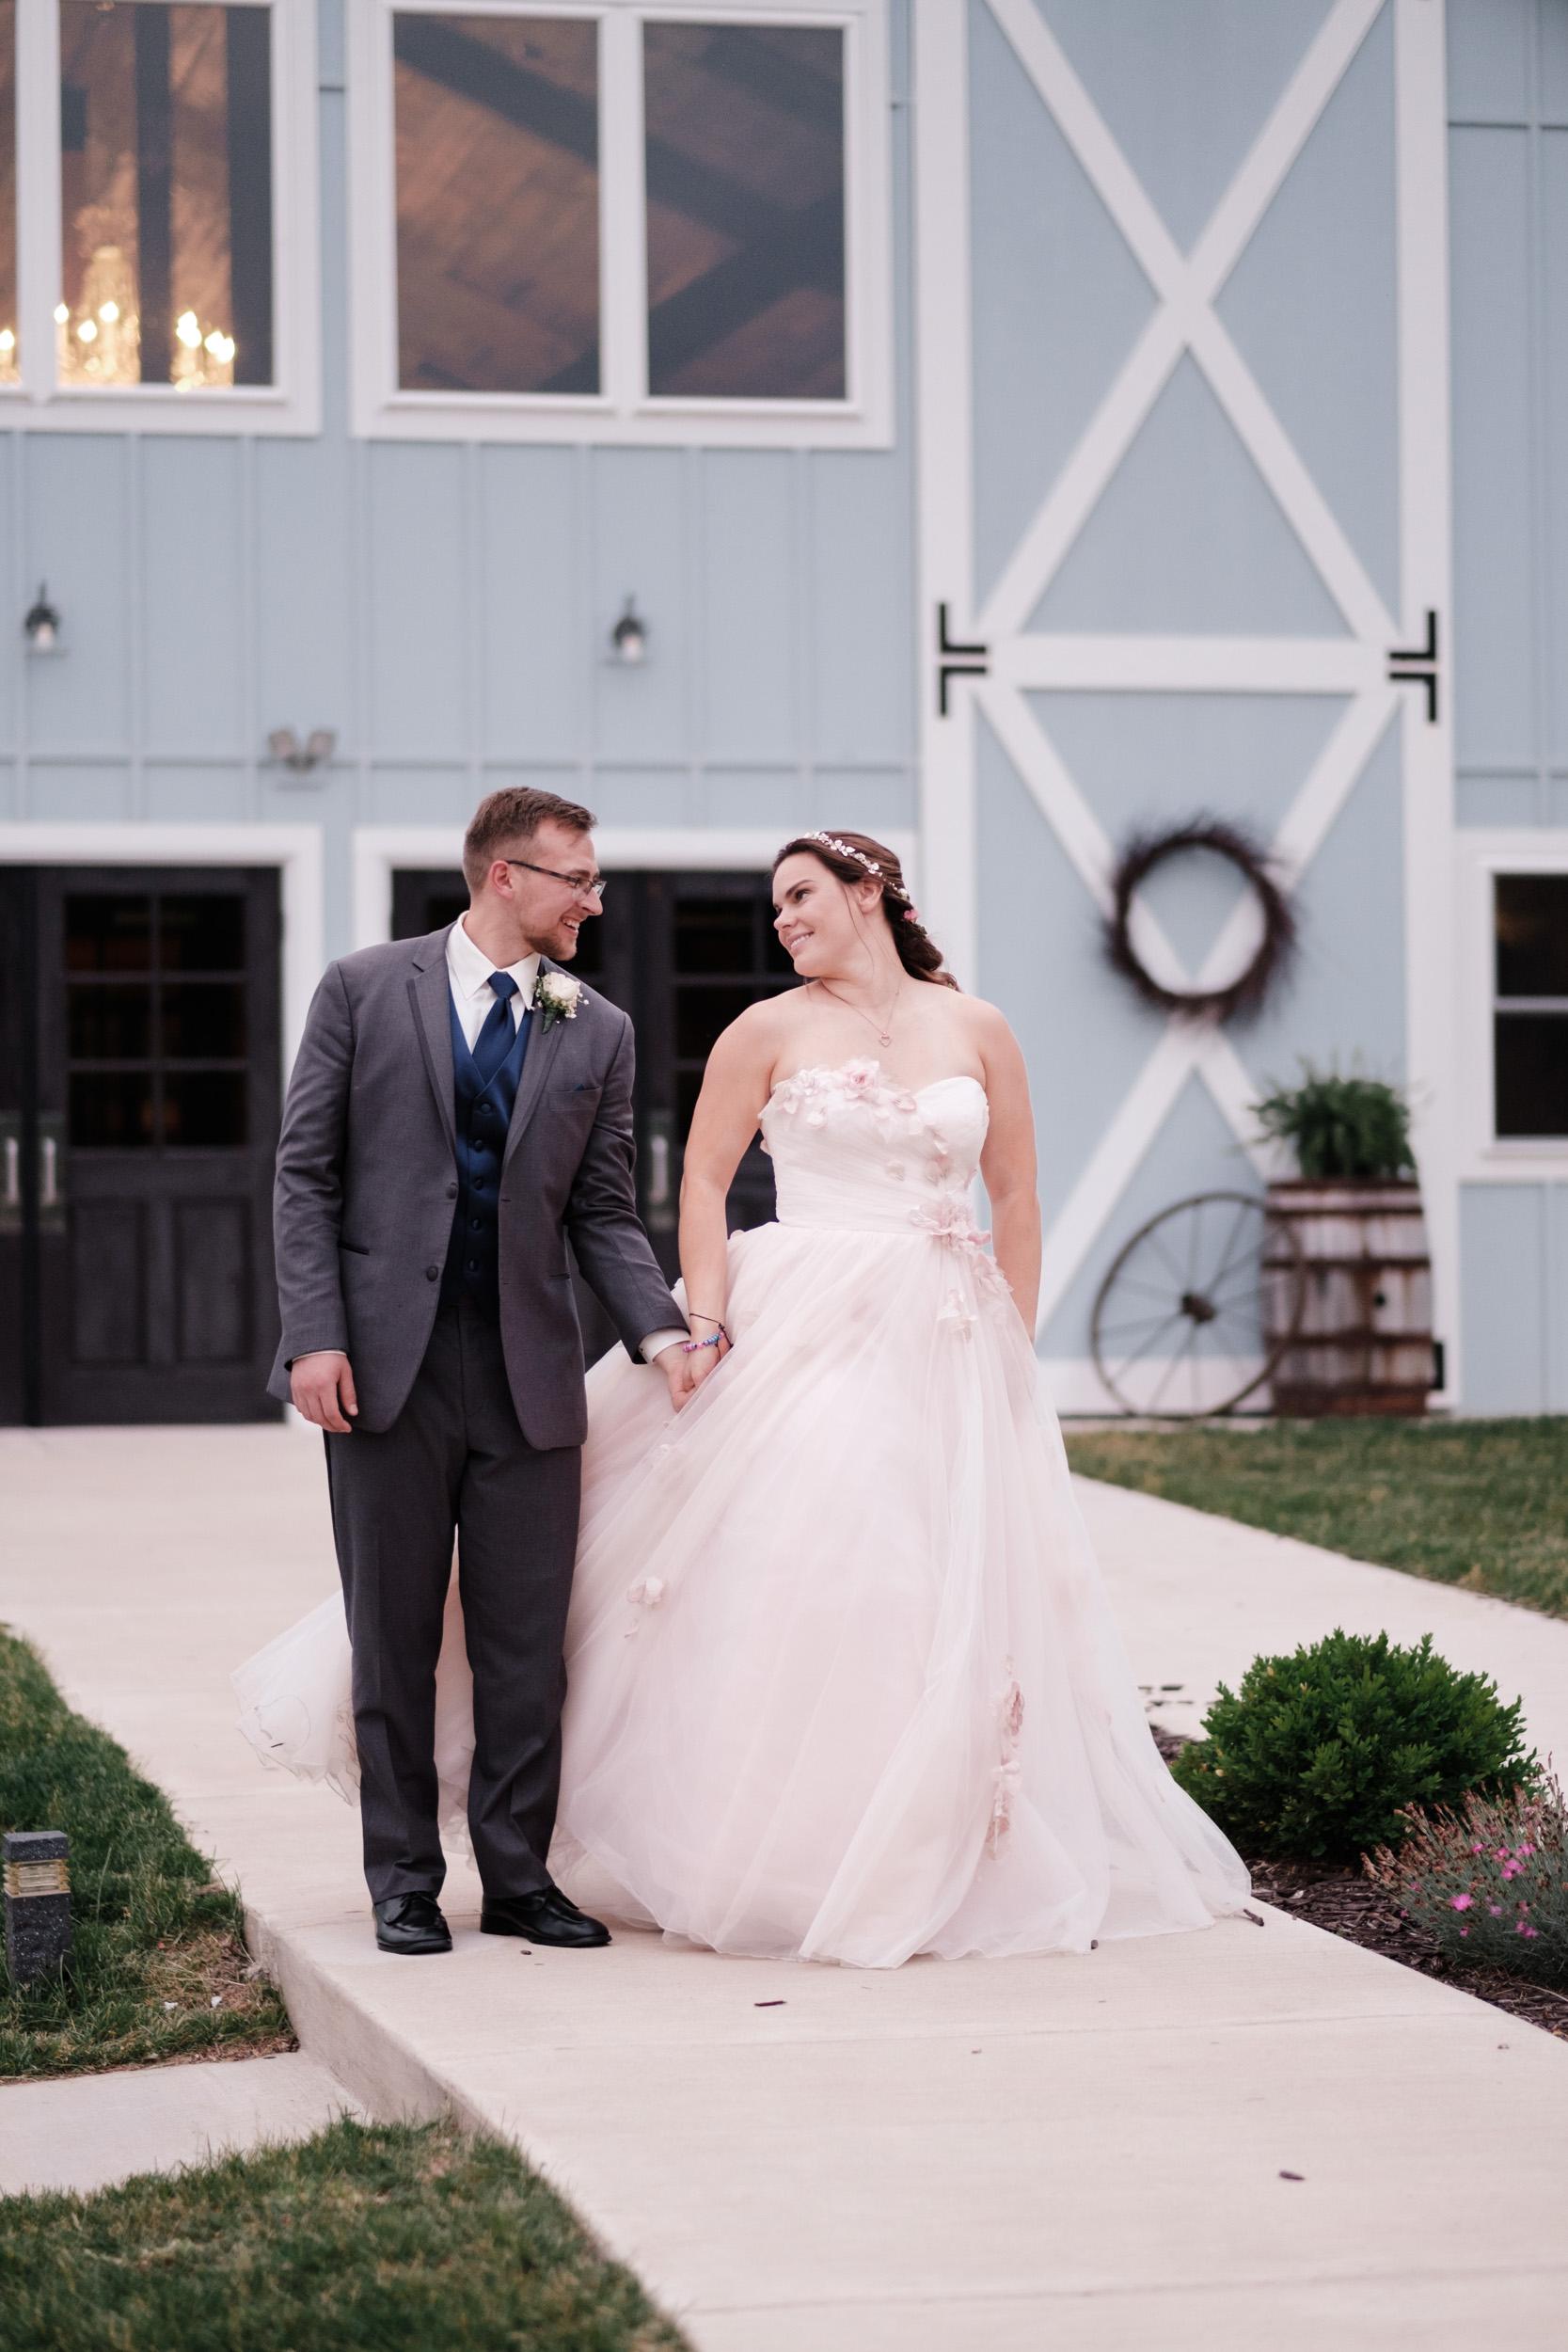 19-06-22-Ryan-Katie-The-Fields-Reserve-Wedding-70.jpg